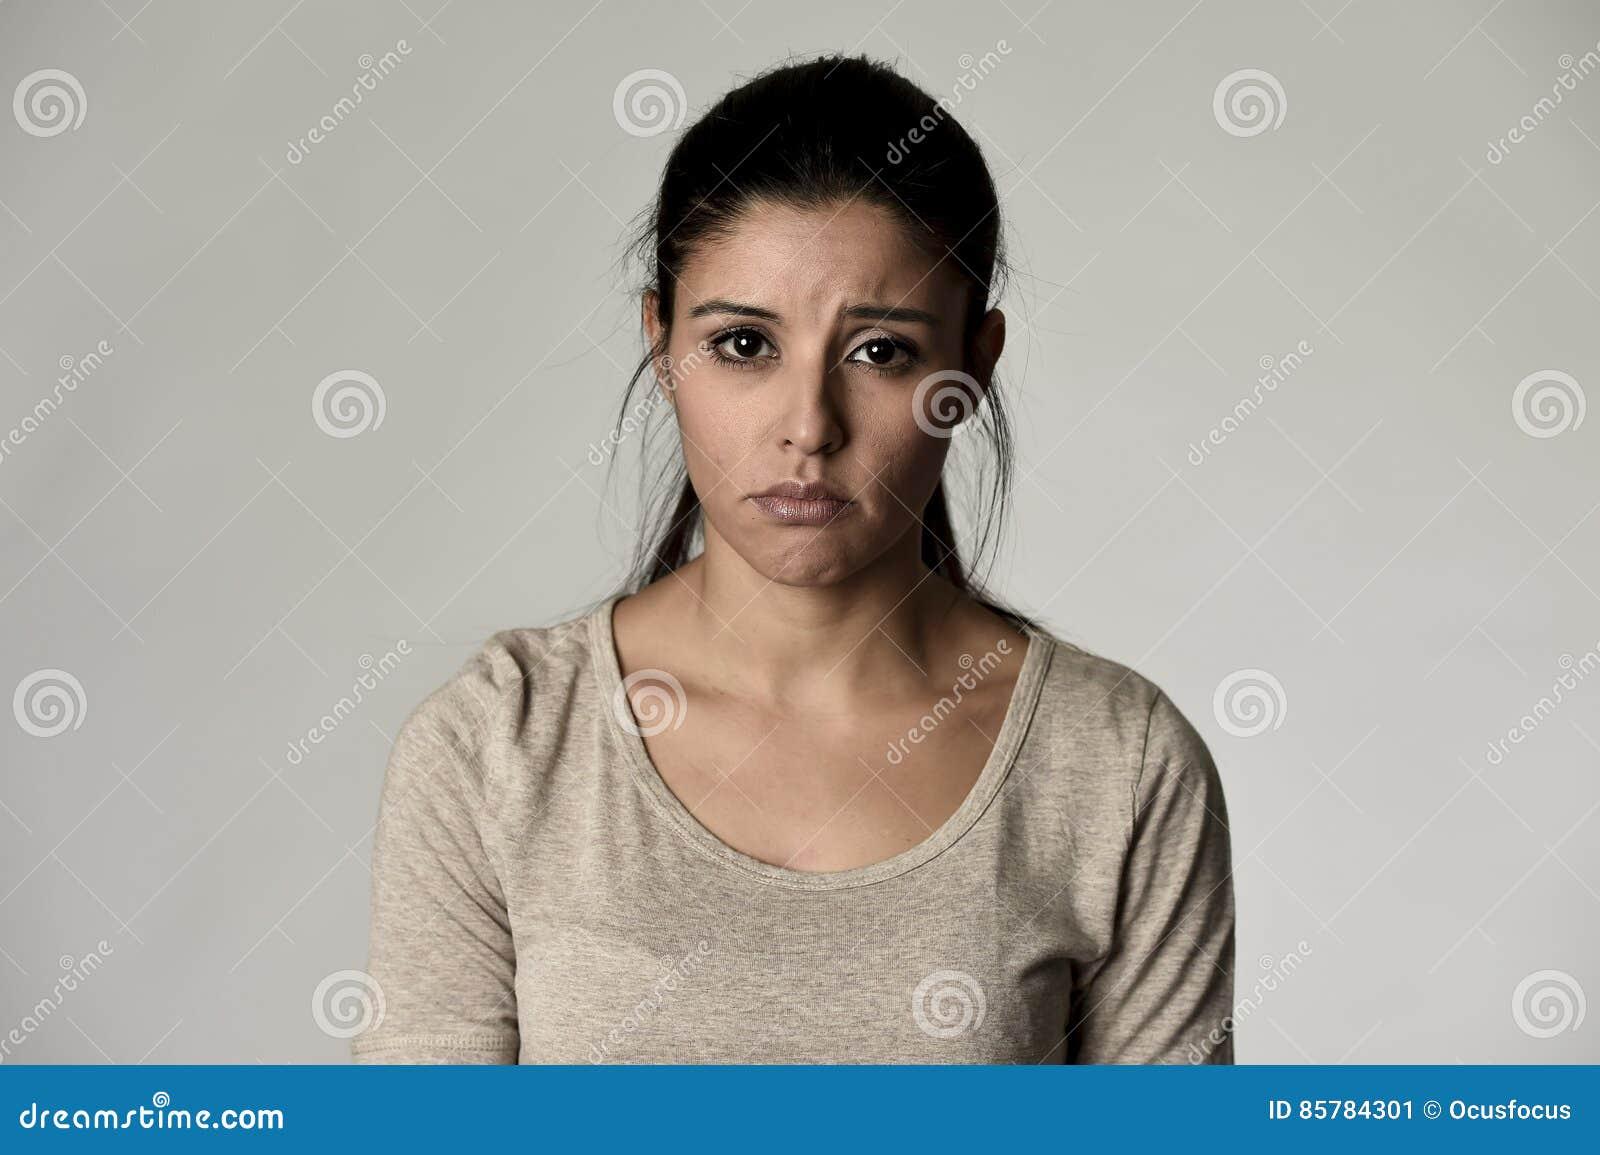 young beautiful hispanic sad woman serious and concerned